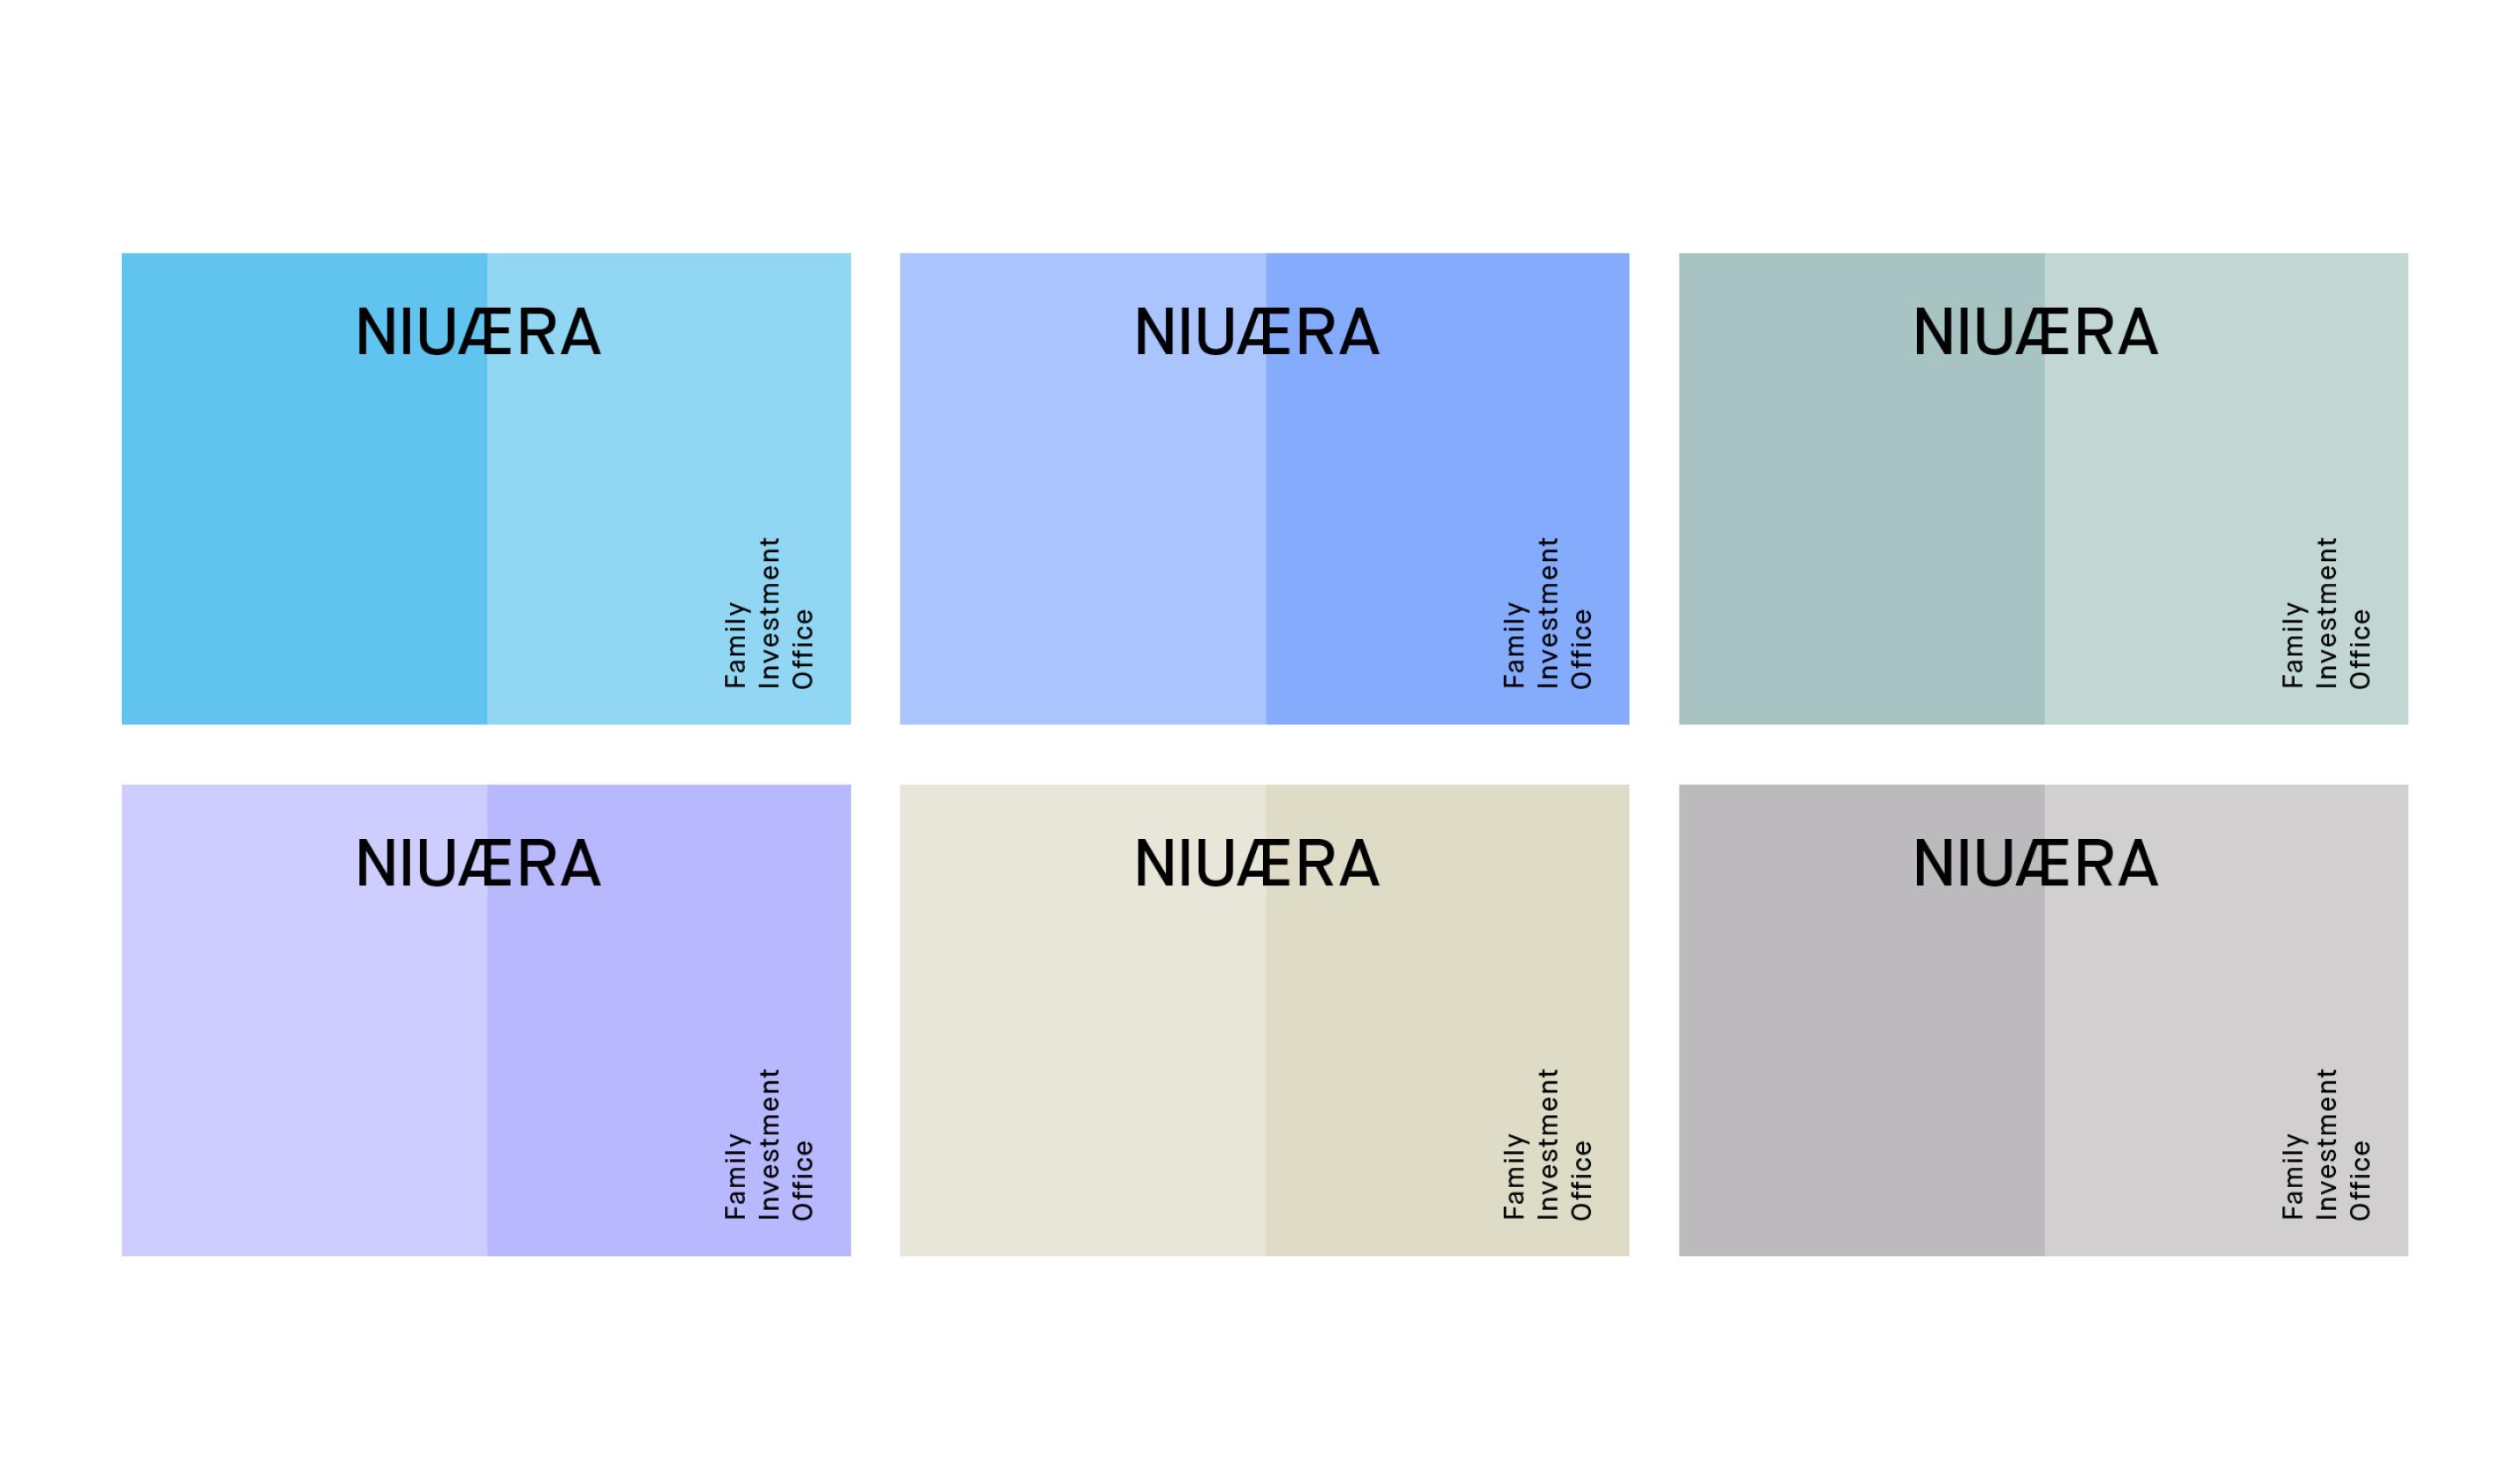 NIUAERA_CI_2